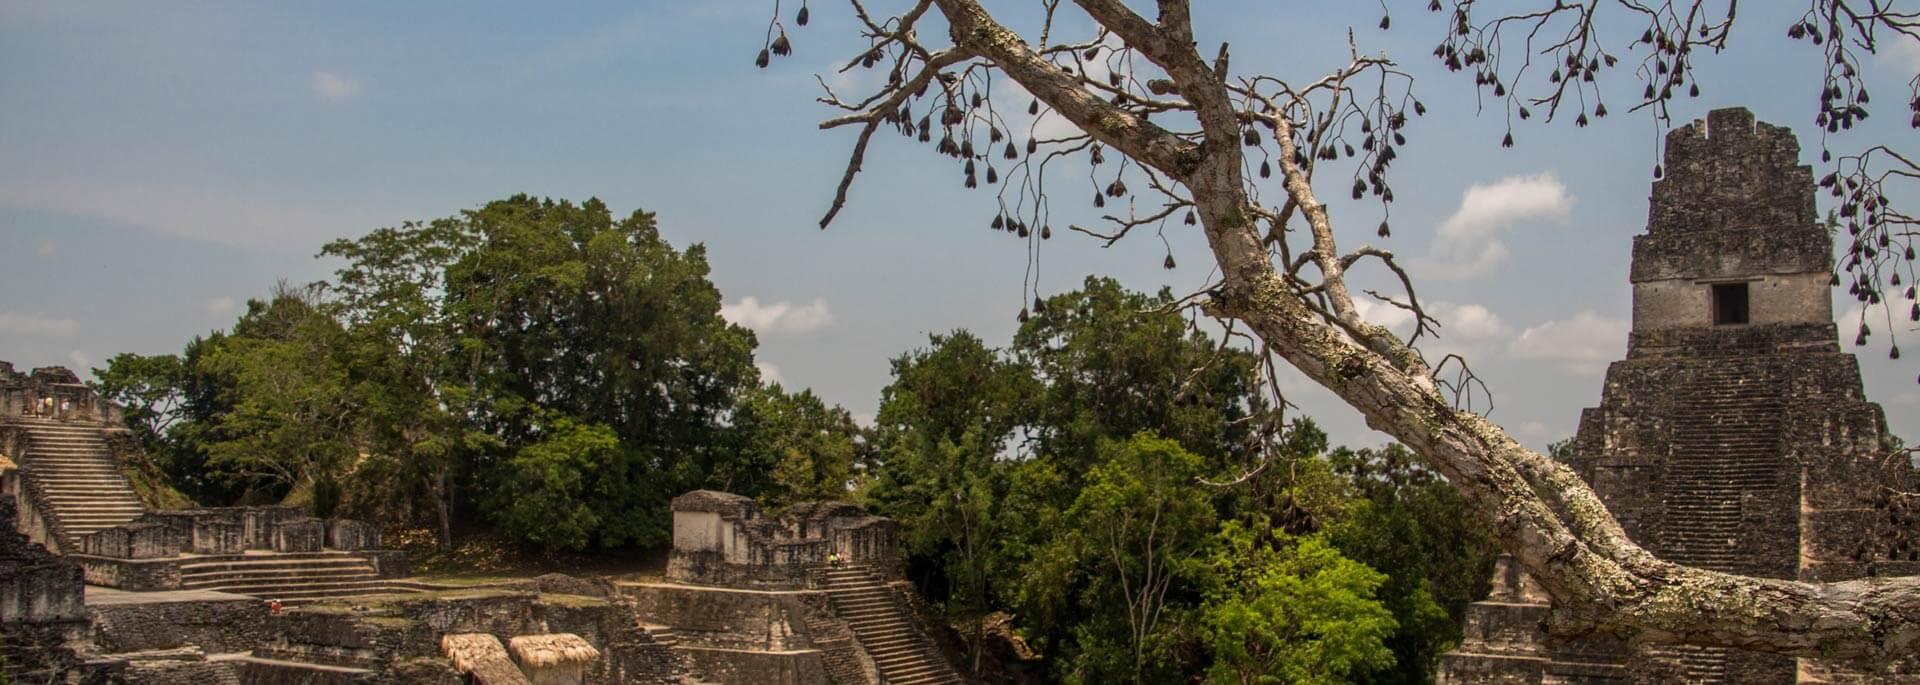 Reisetipp: Tikal – Guatemalas größte Mayastätte